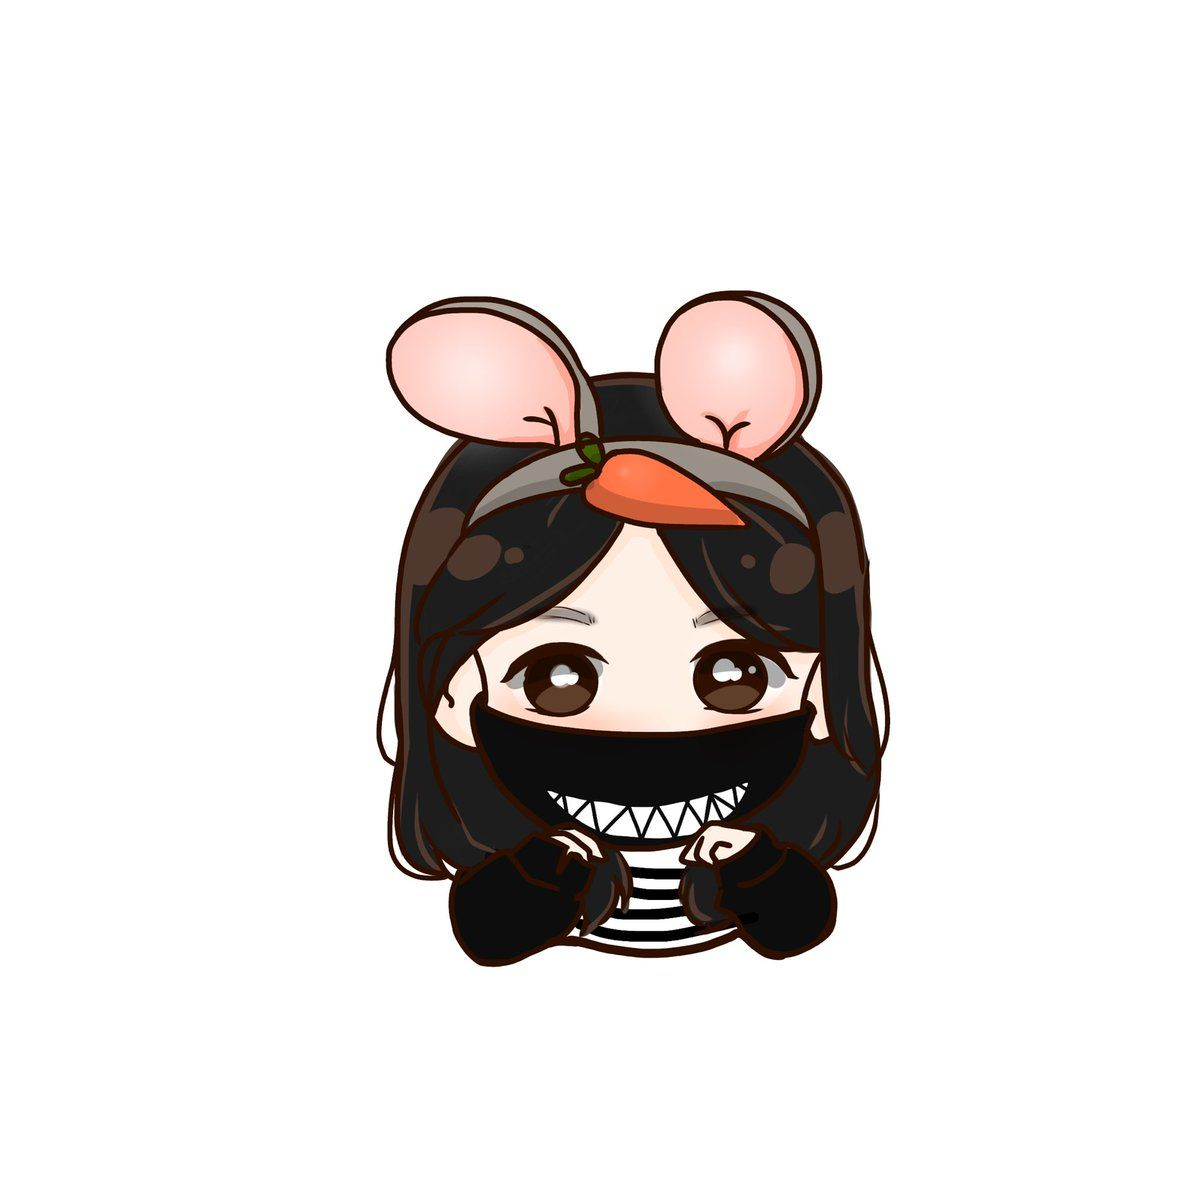 Pin Oleh Kim Jojo Di Snsd Fanart Animasi